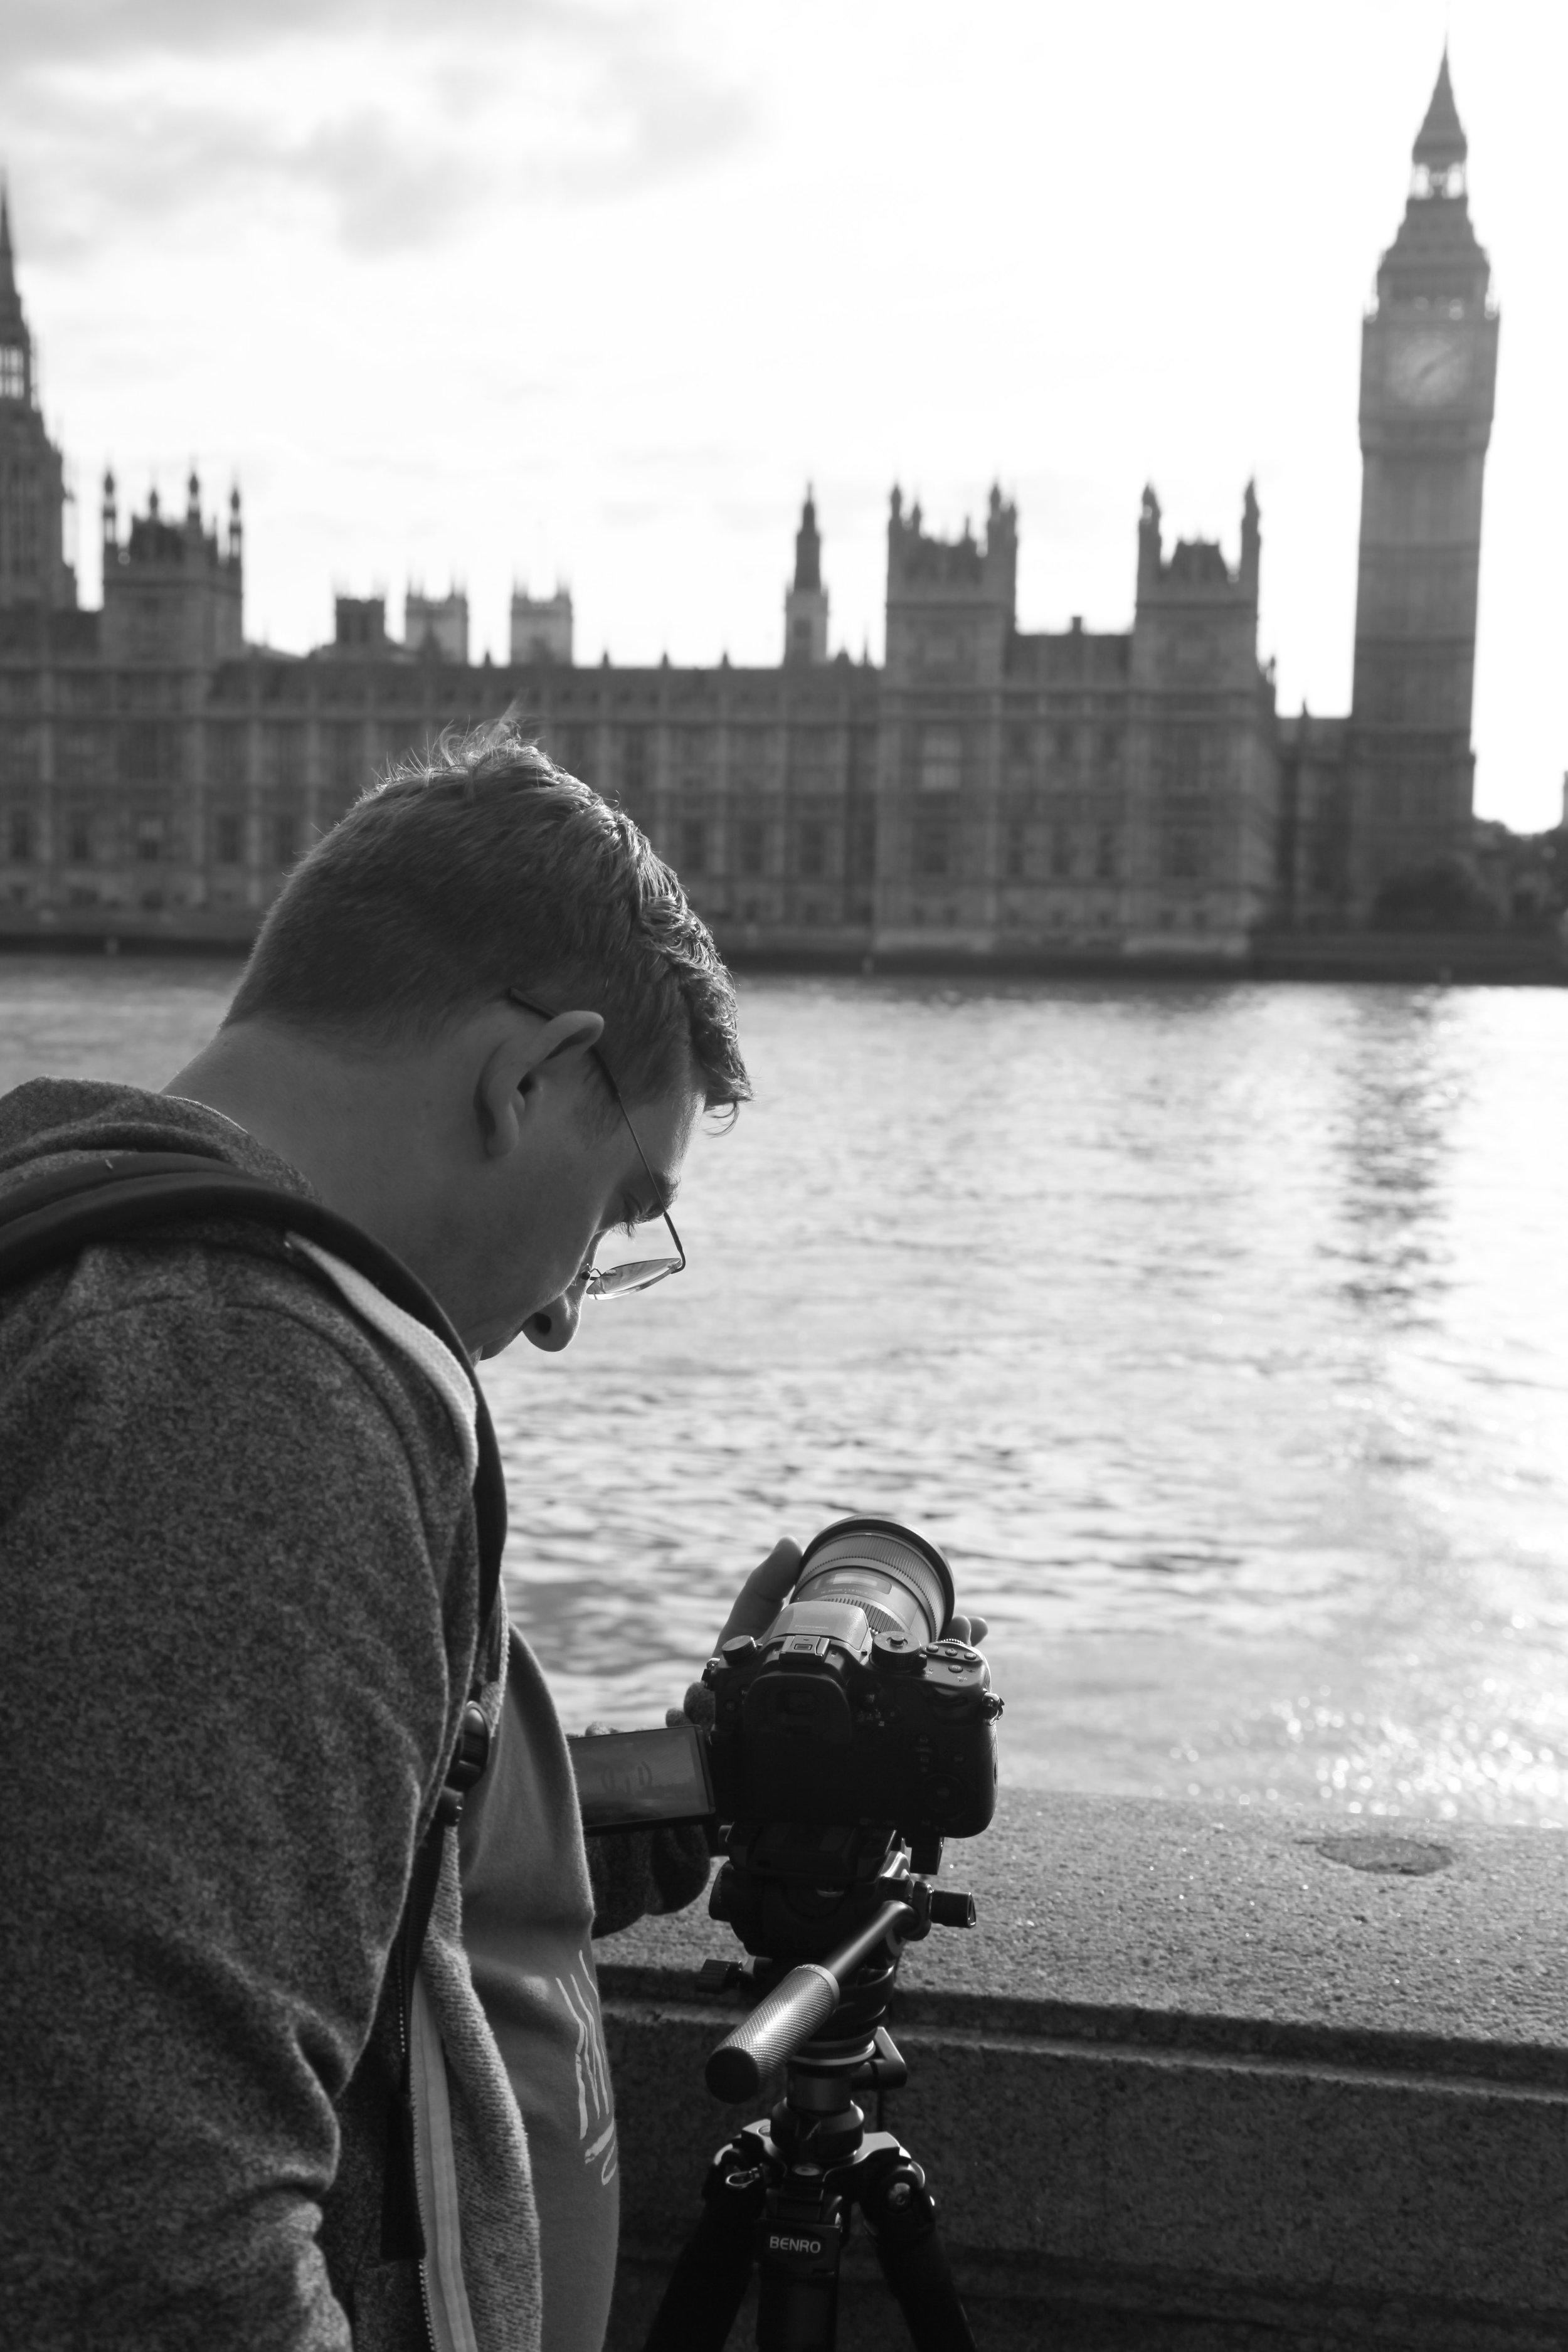 Eric Tesainer shooting a time lapse